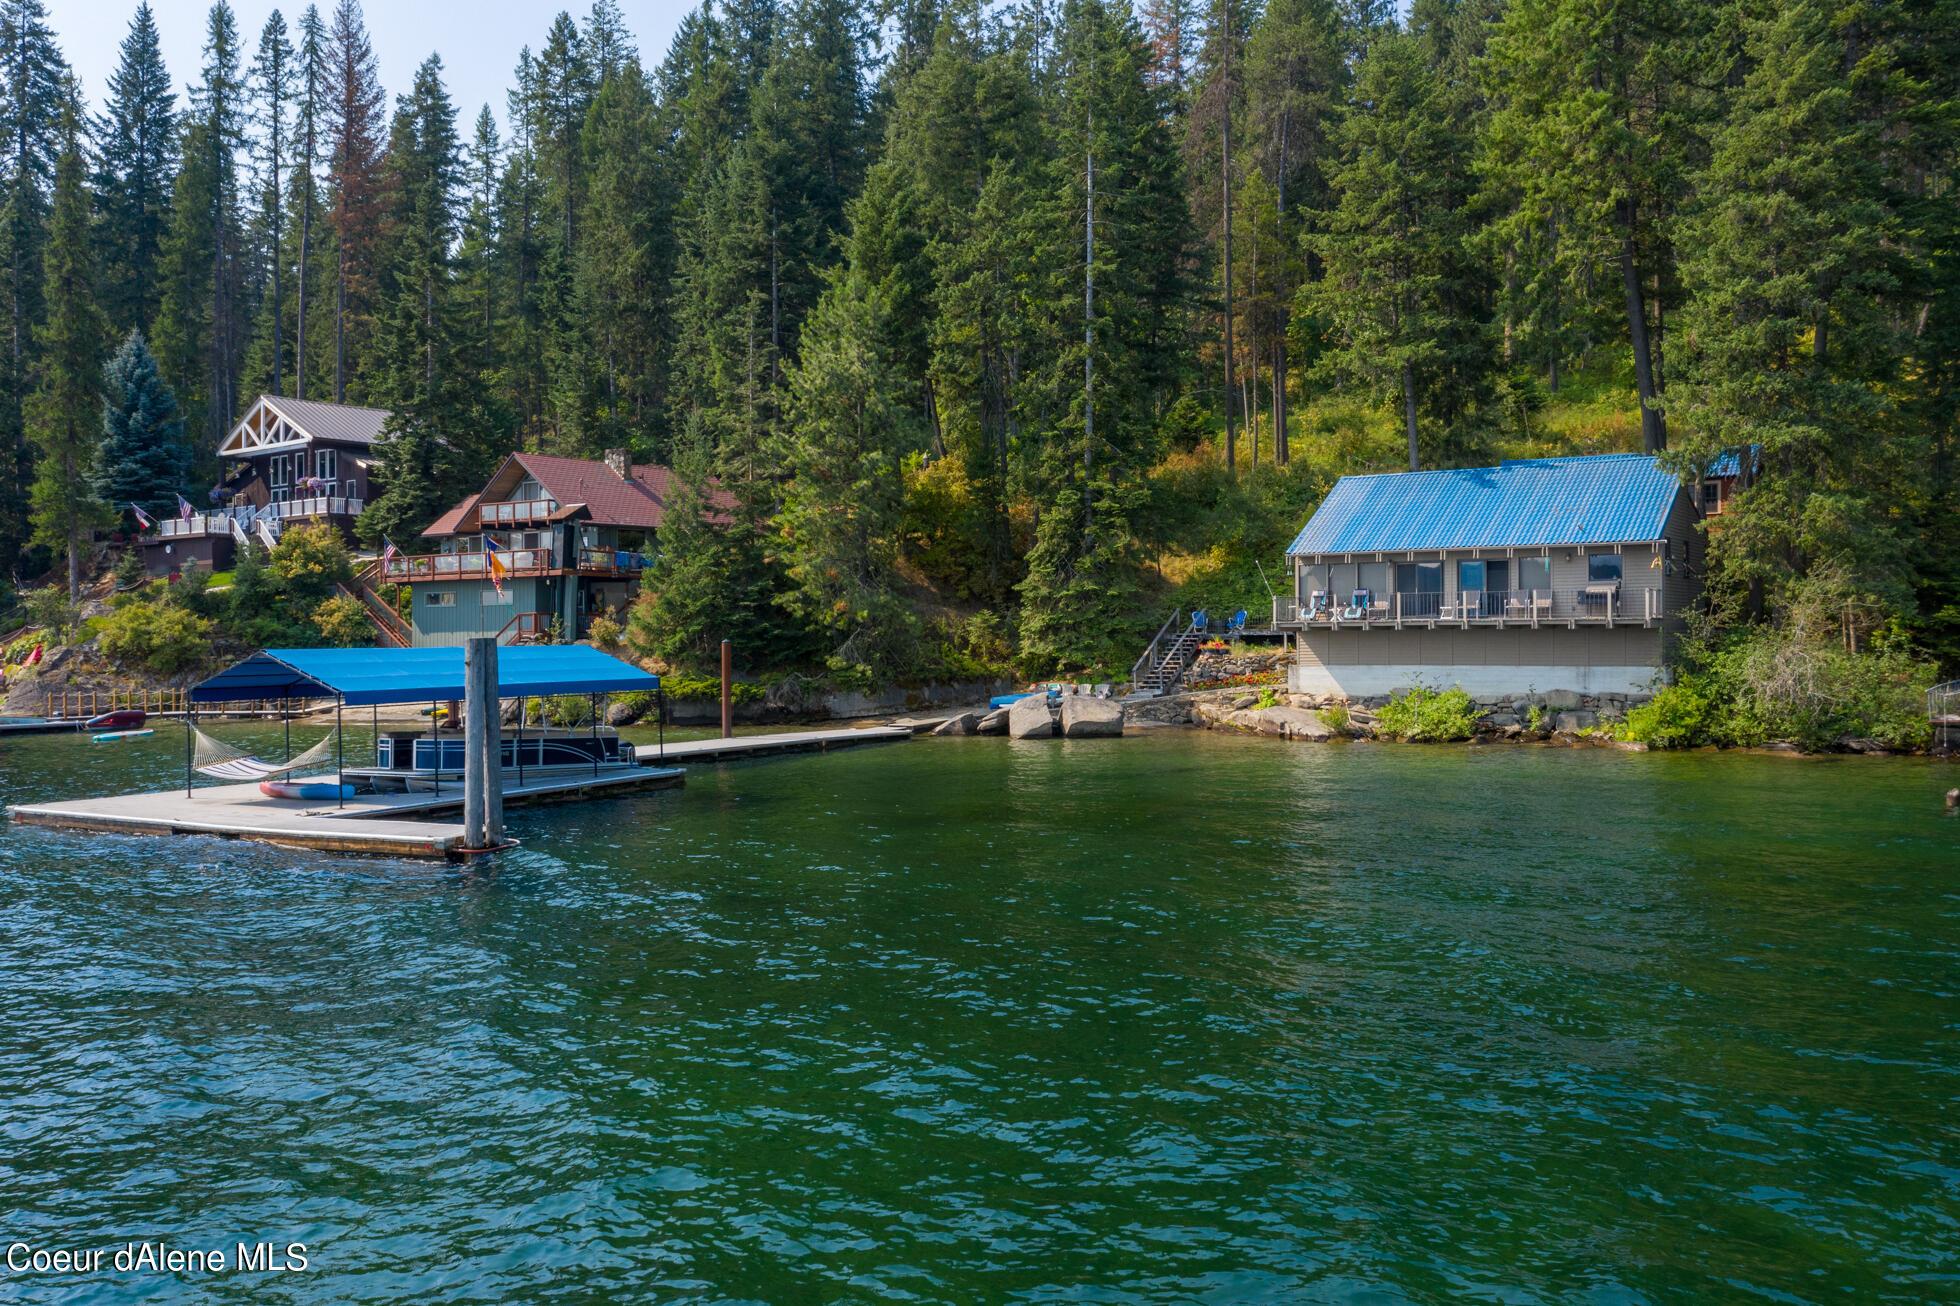 photo of 9169 W COEUR D ALENE LAKE SHR Coeur d'Alene Idaho 83814